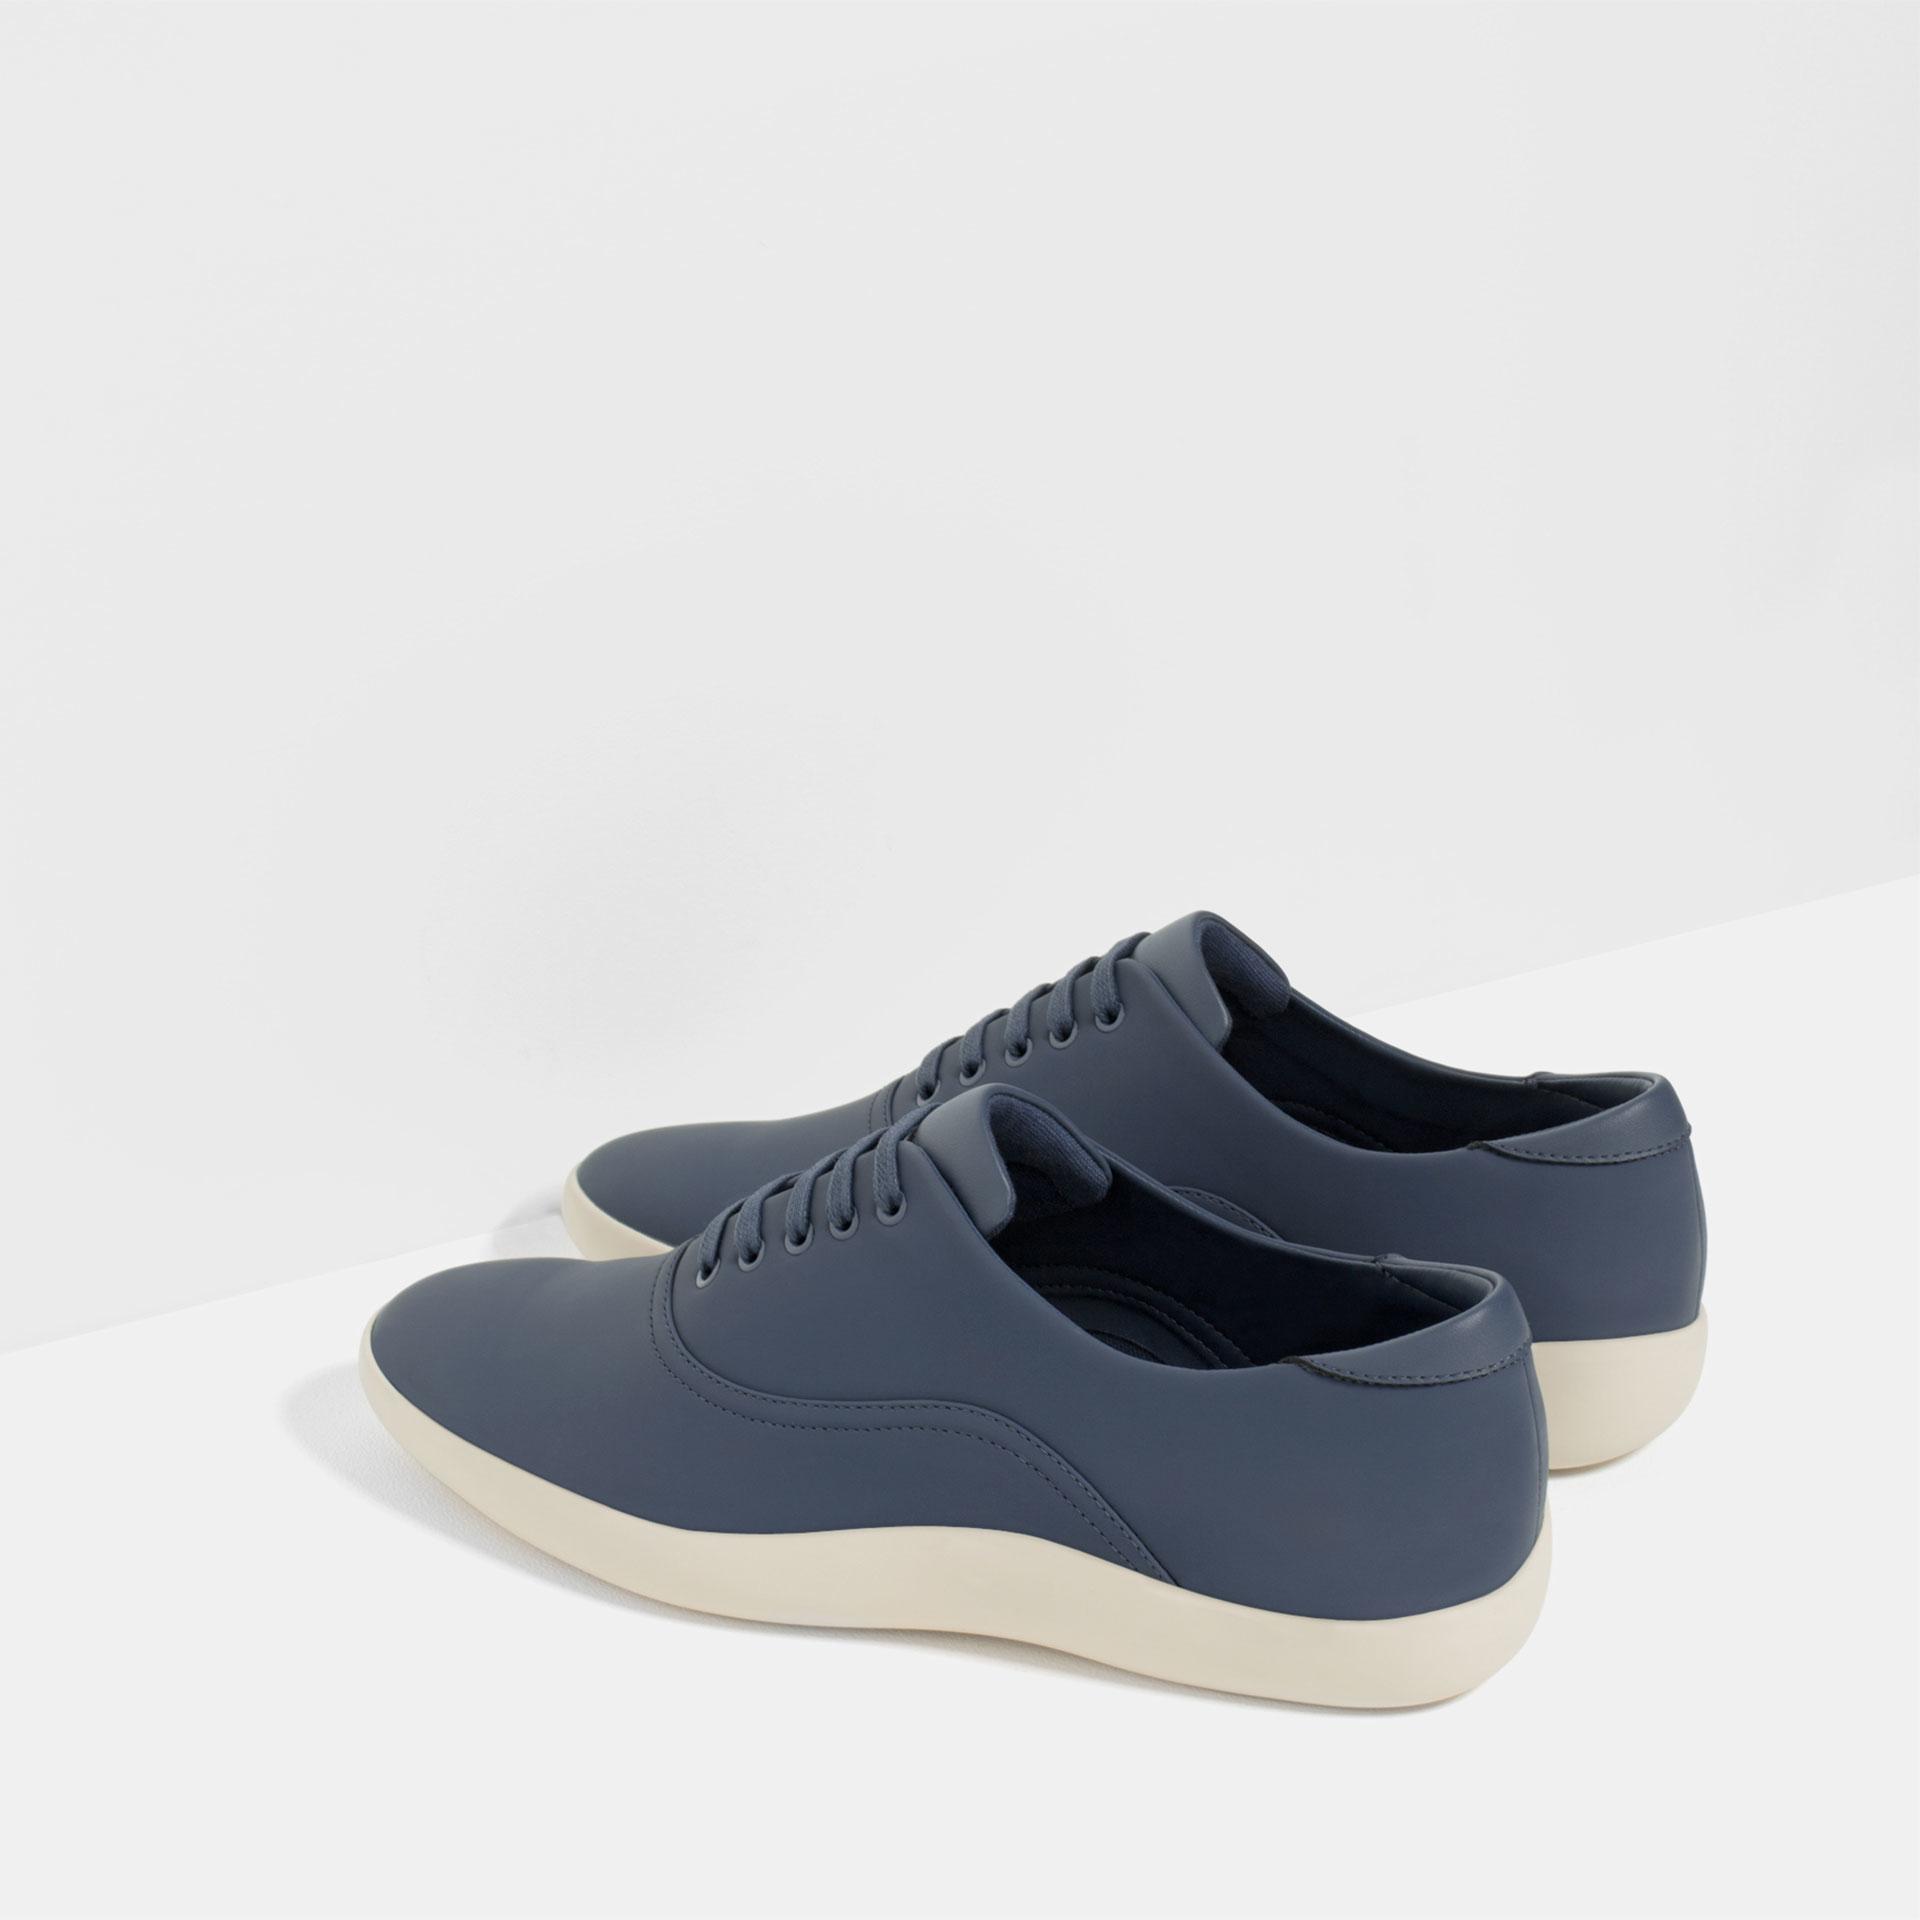 Man Cave Urban Zara : Zara urban sneakers in blue for men lyst